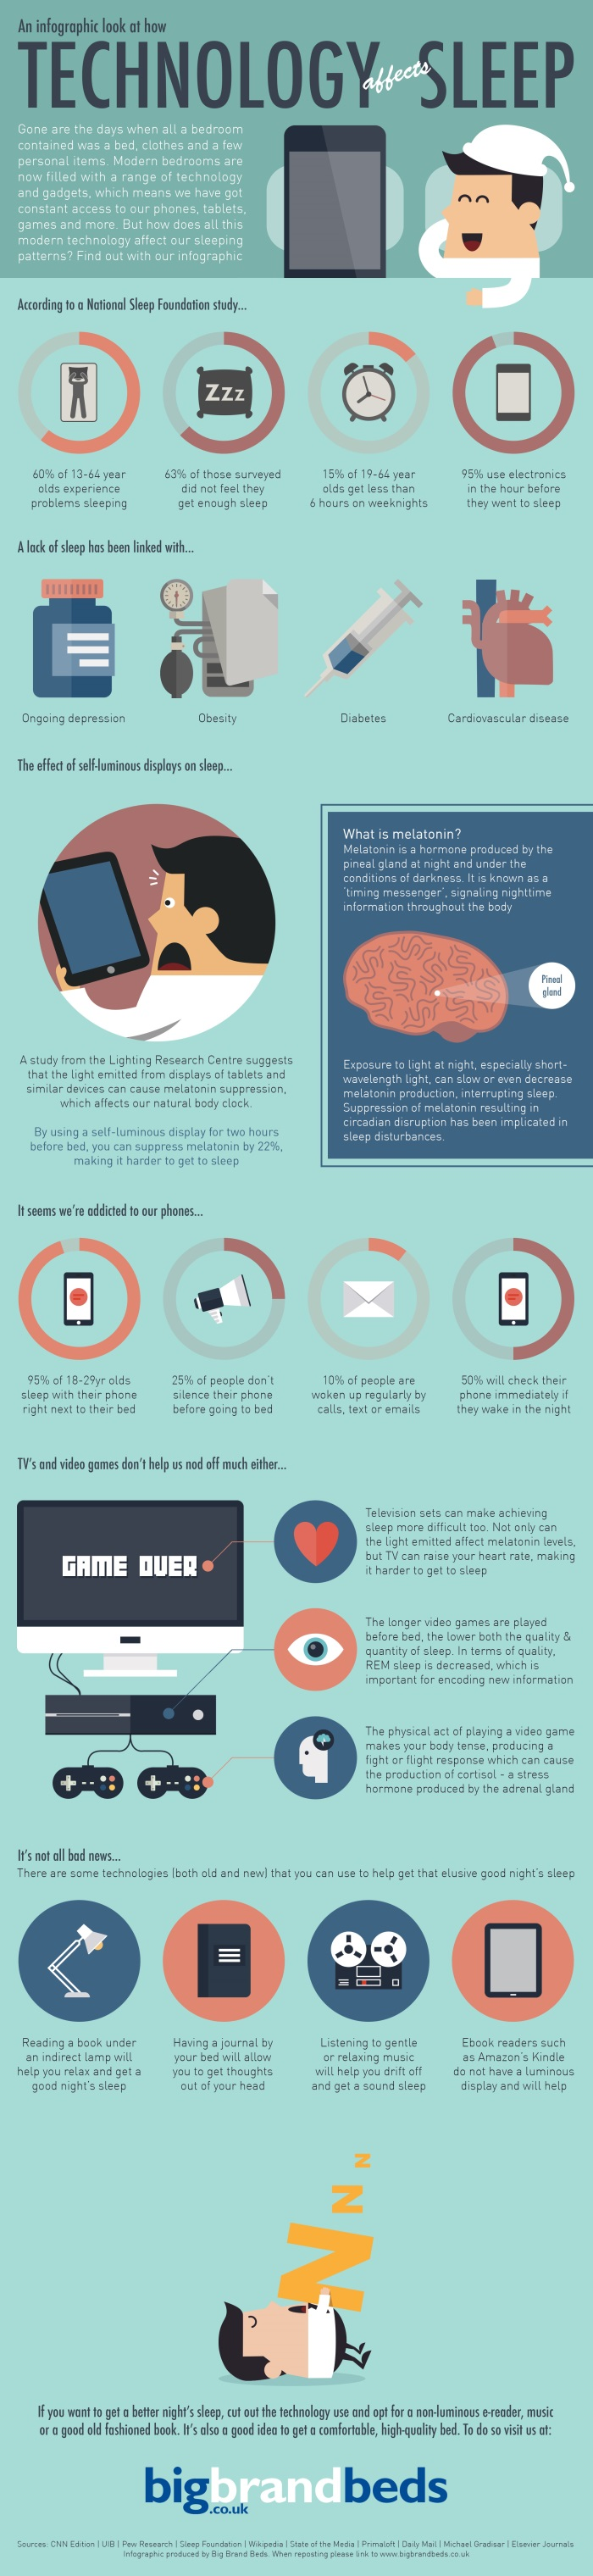 TN000338 - Sleep infographic